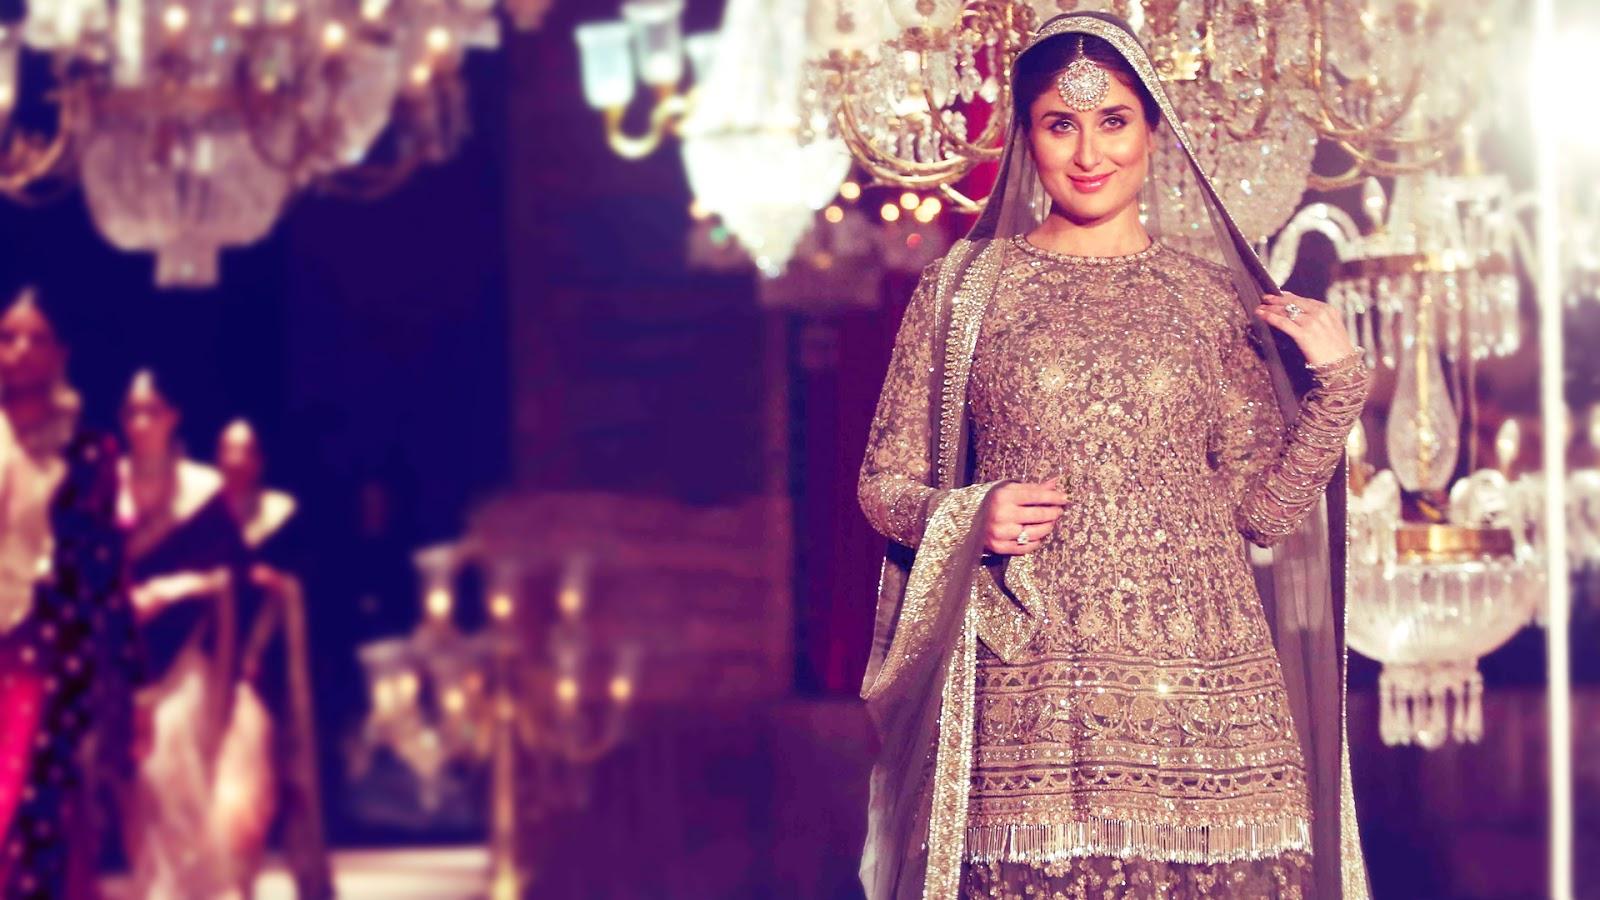 Kareena Kapoor Khan Wallpapers Hd Download Free 1080P -6832